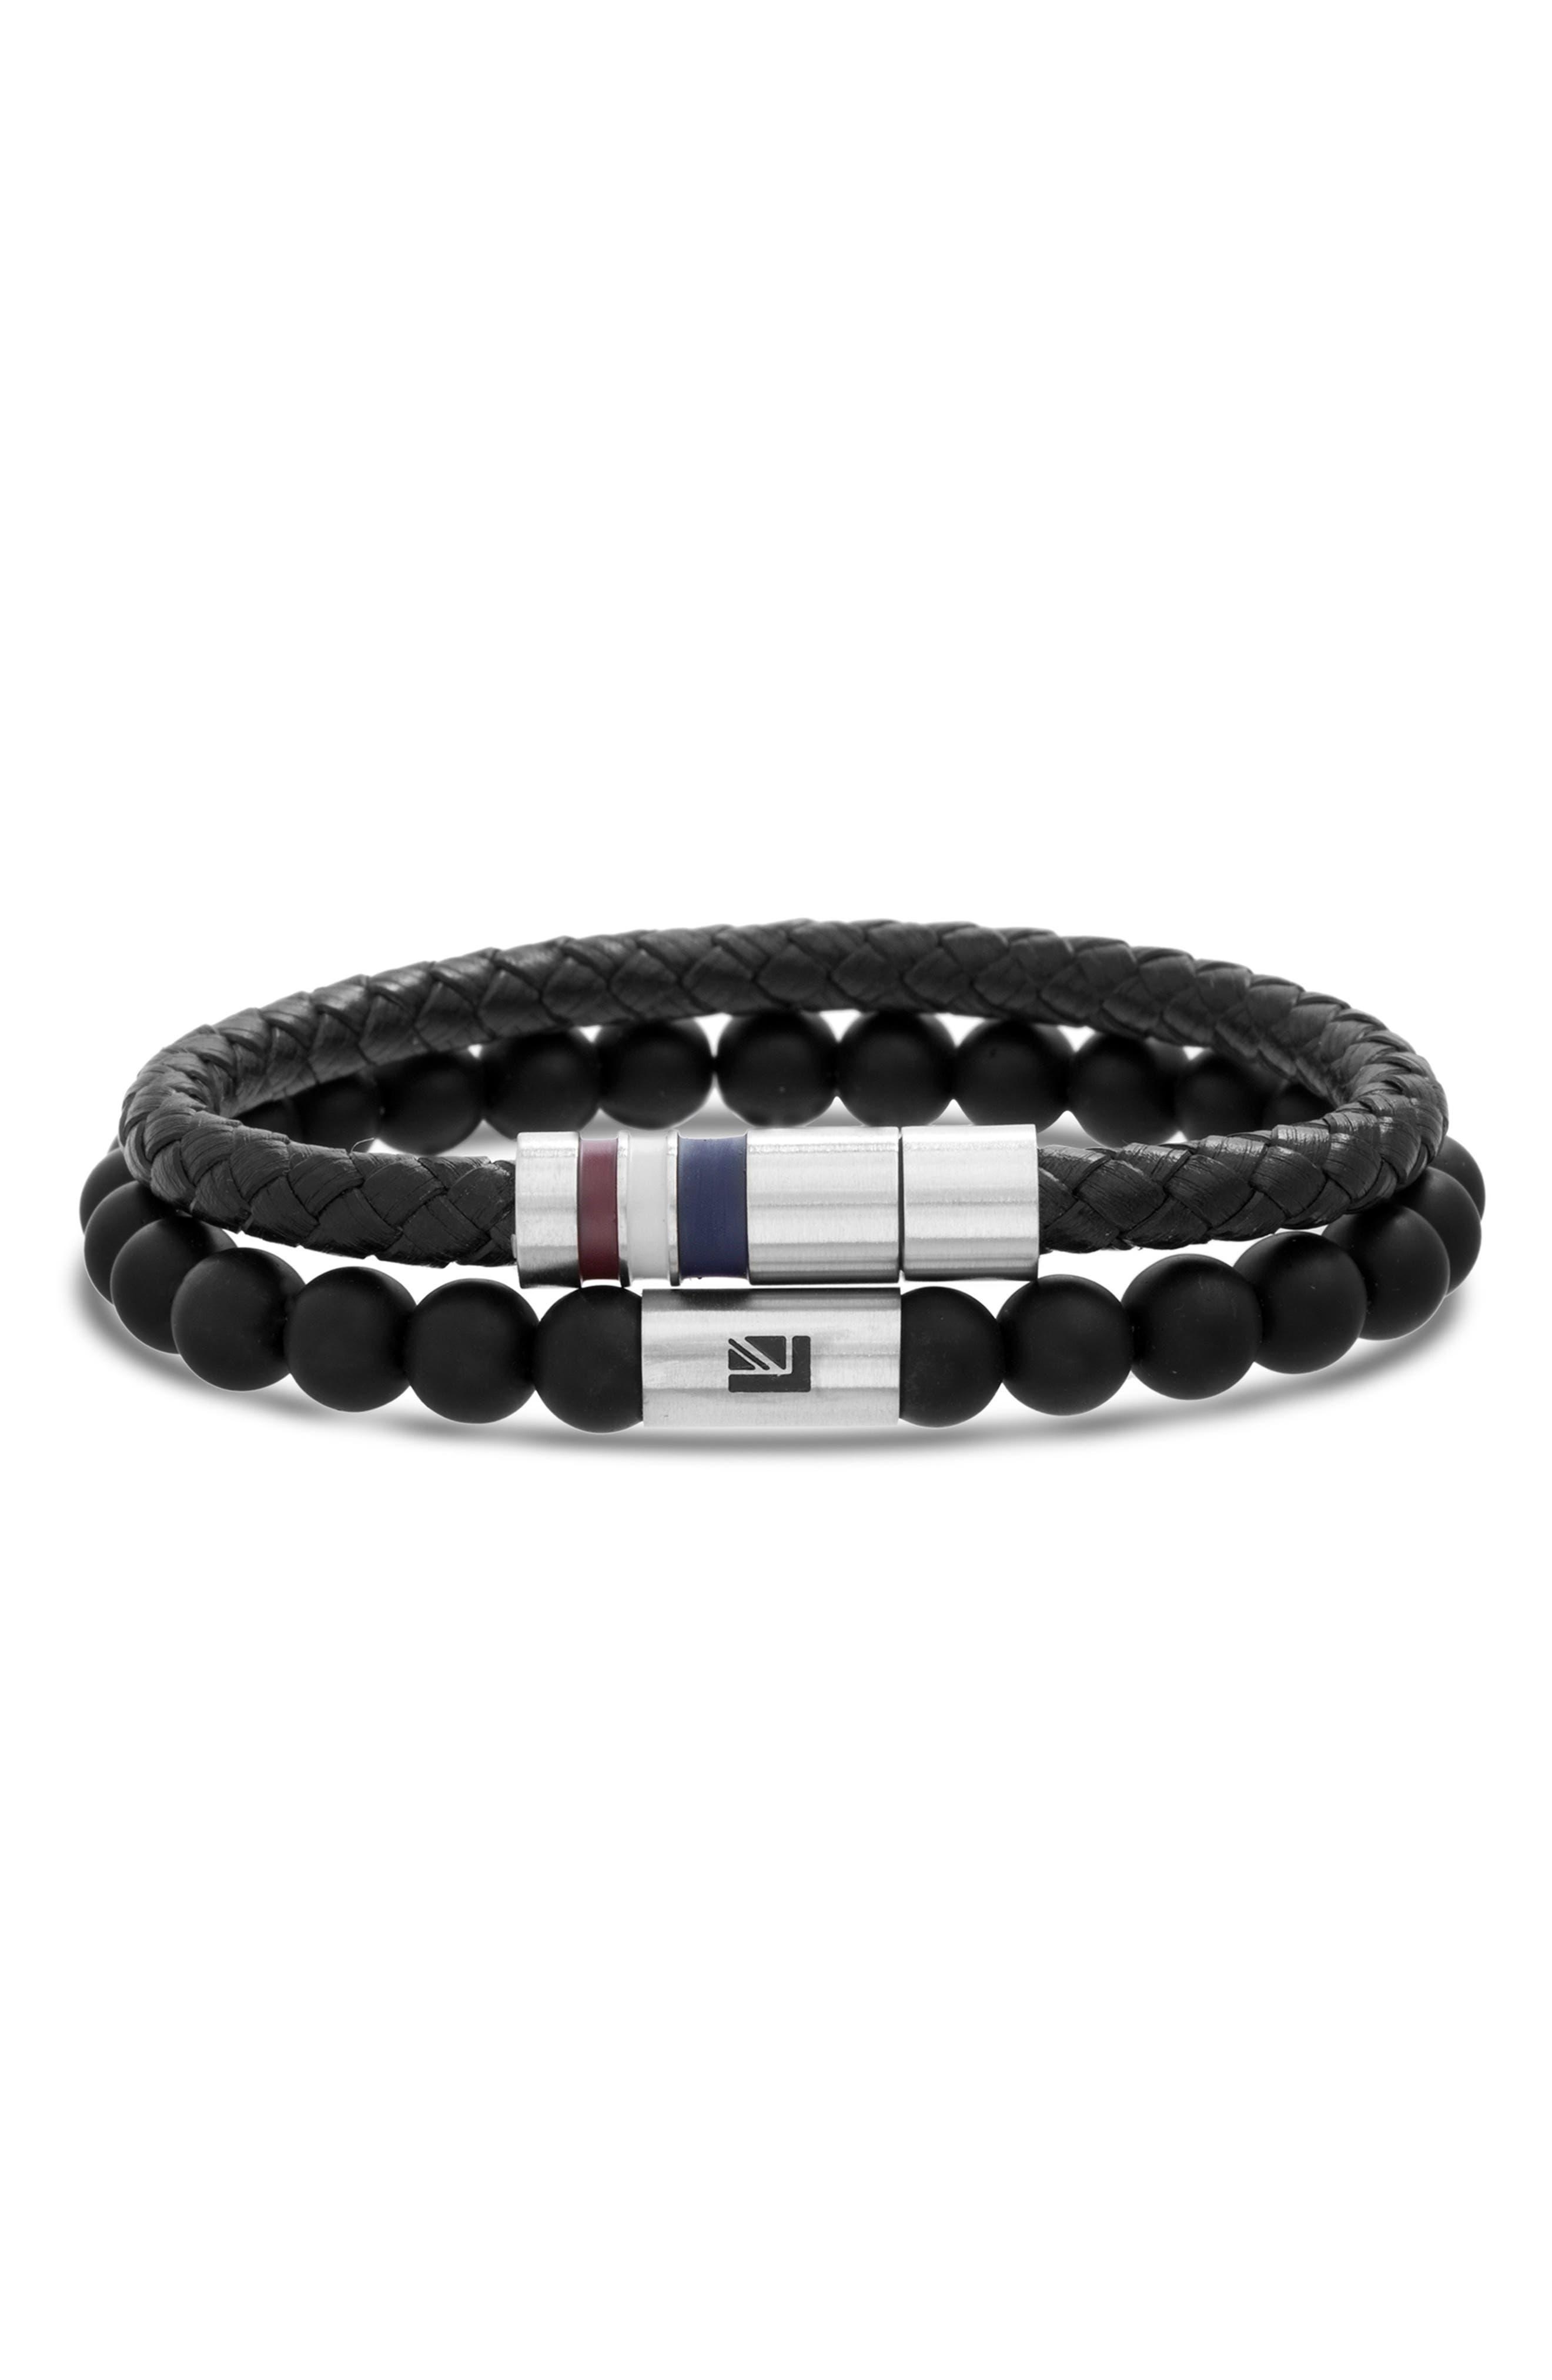 BEN SHERMAN Leather & Bead Bracelet Set in Black